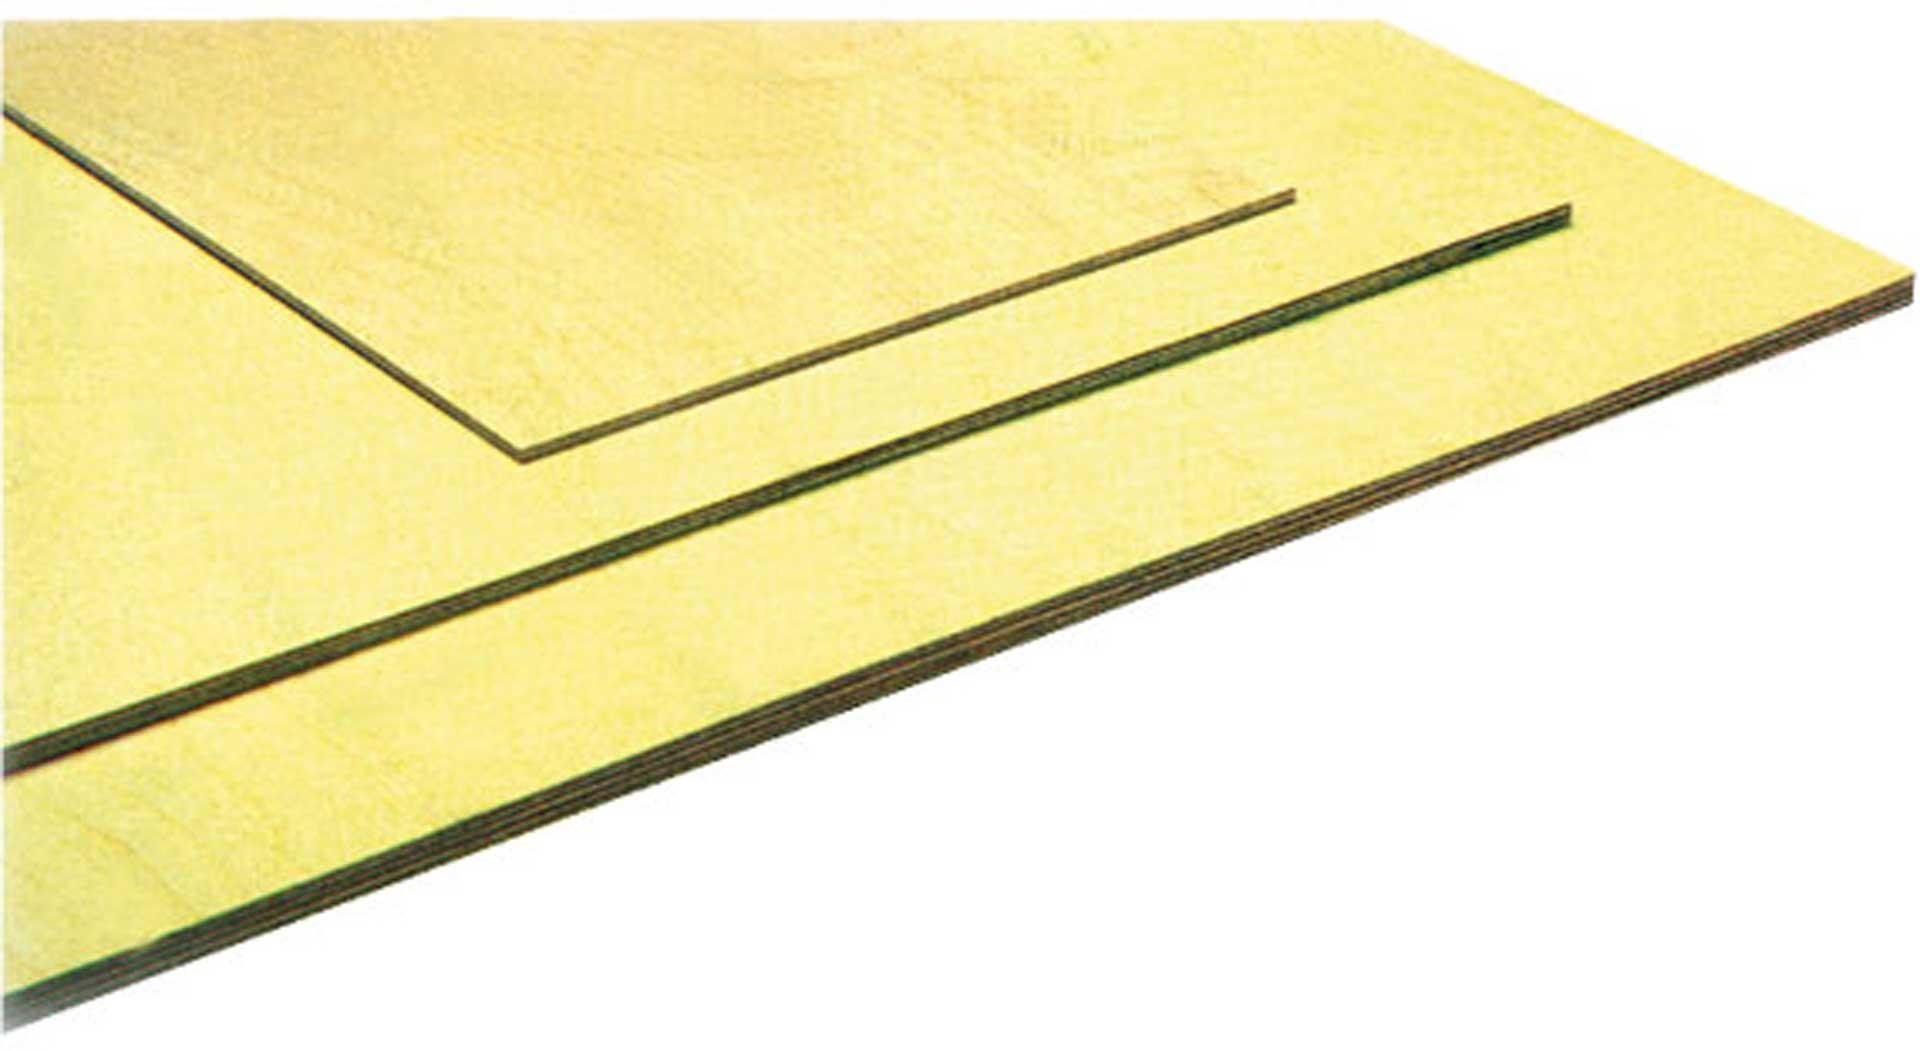 MODELLBAU LINDINGER BIRCH-WOOD 1,5/300/500MM